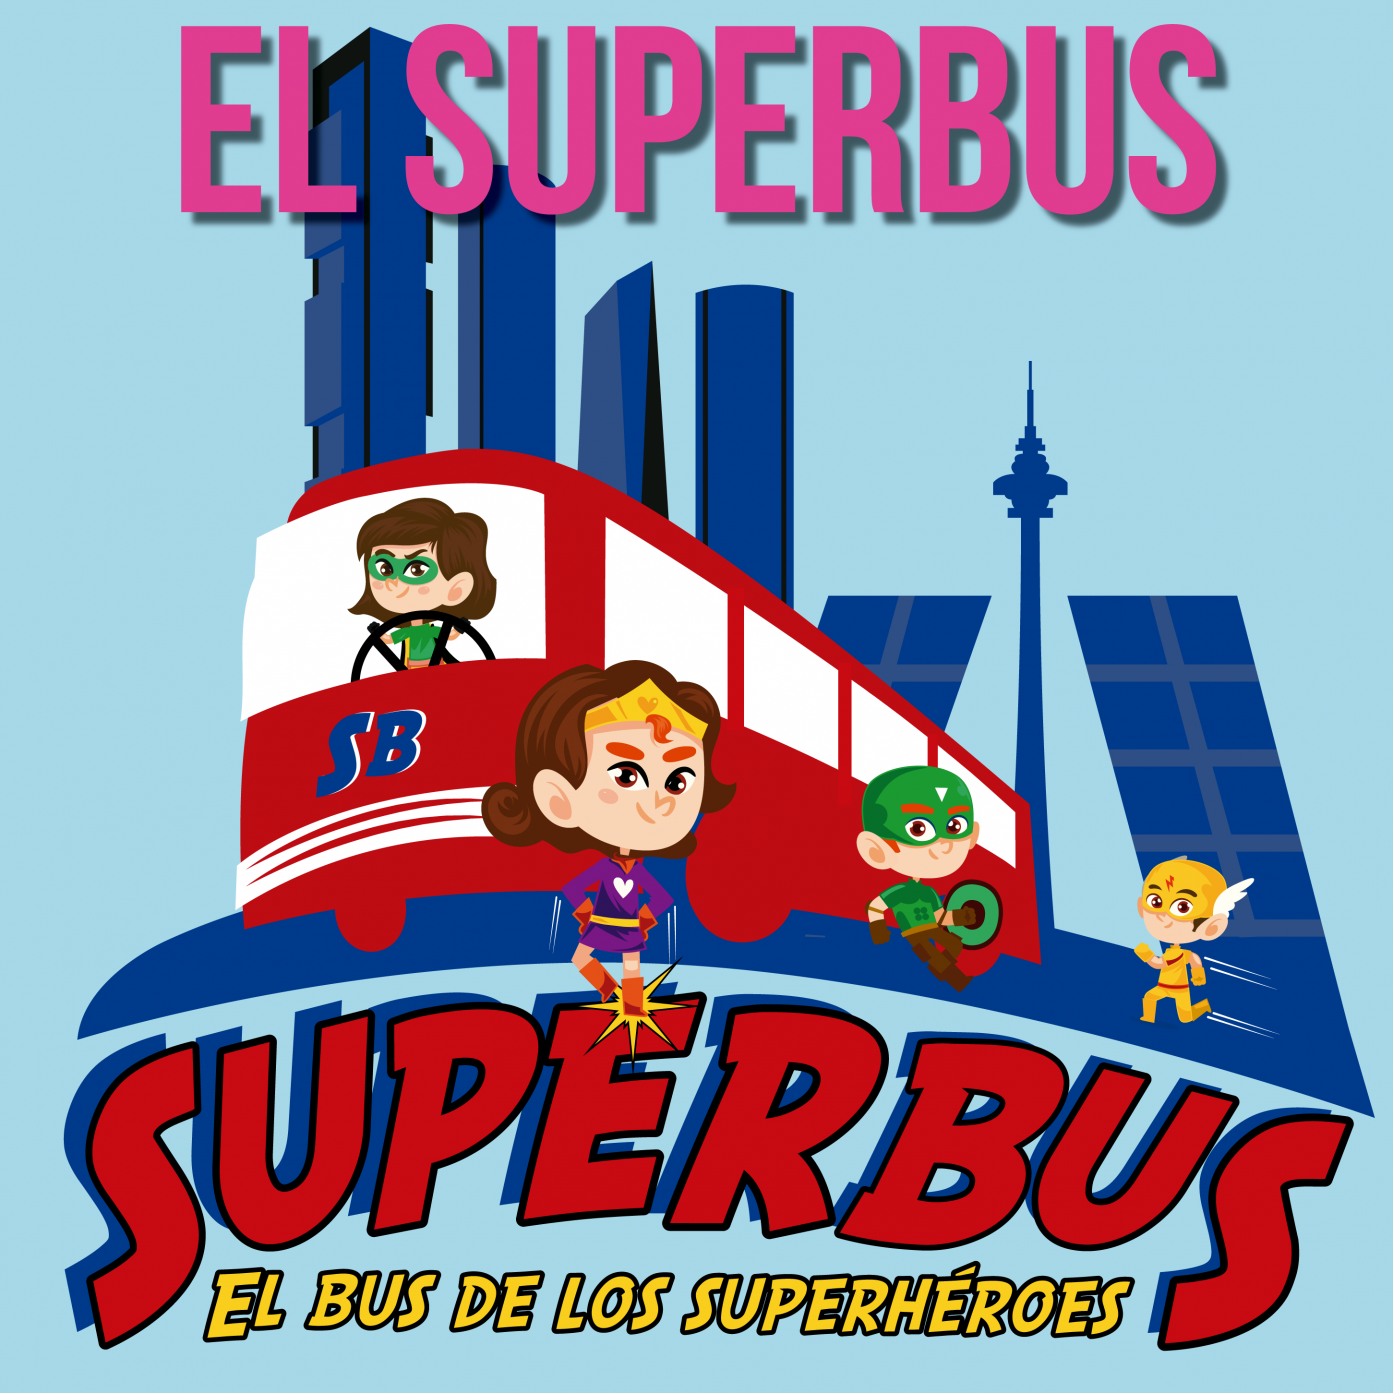 El Superbus